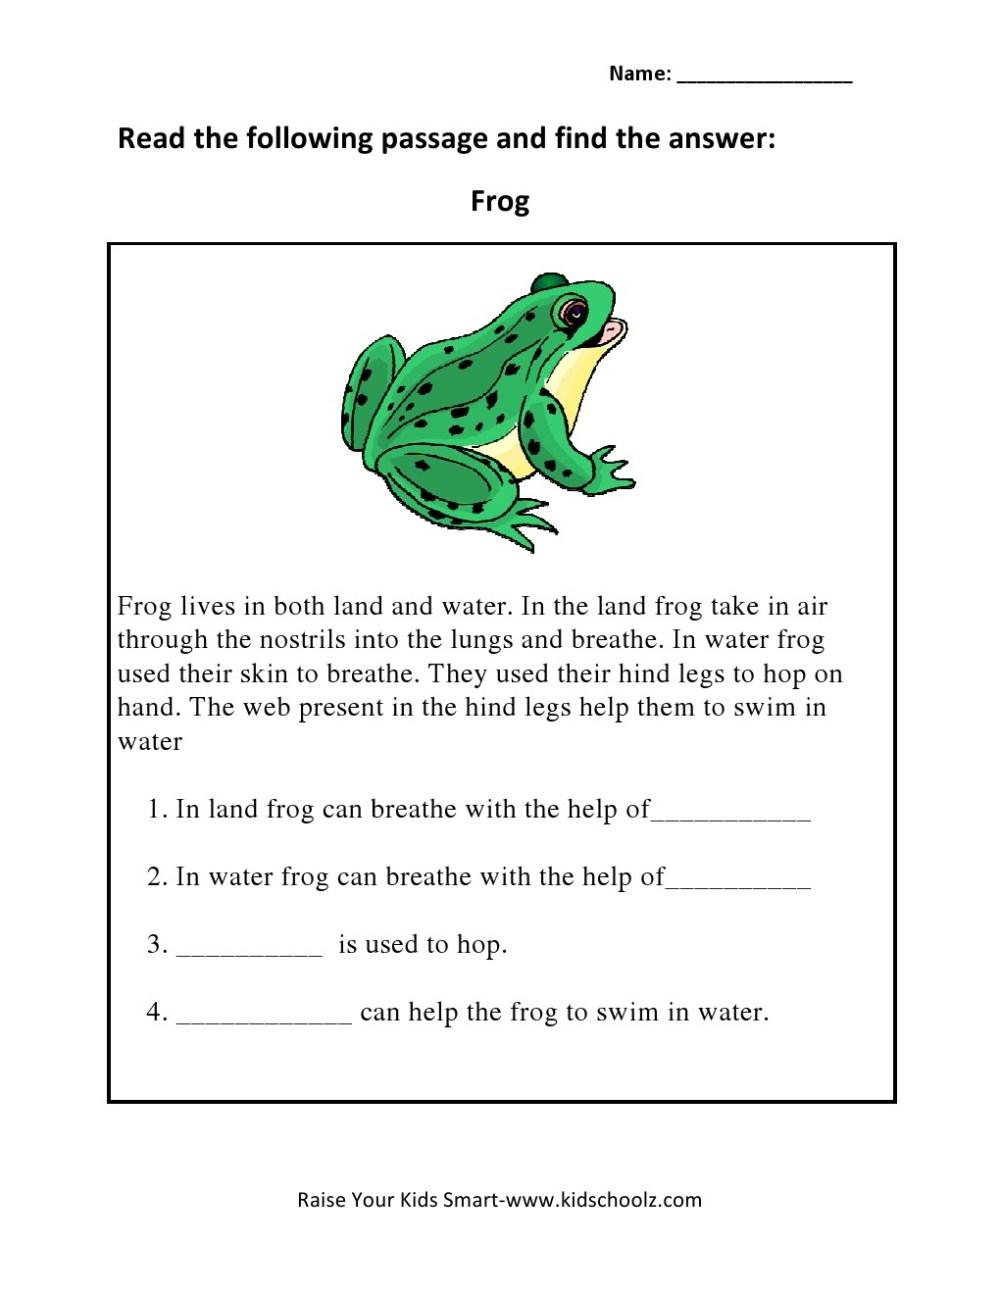 medium resolution of Grade 3 - Animals Read and Answers Worksheet 2 - Kidschoolz